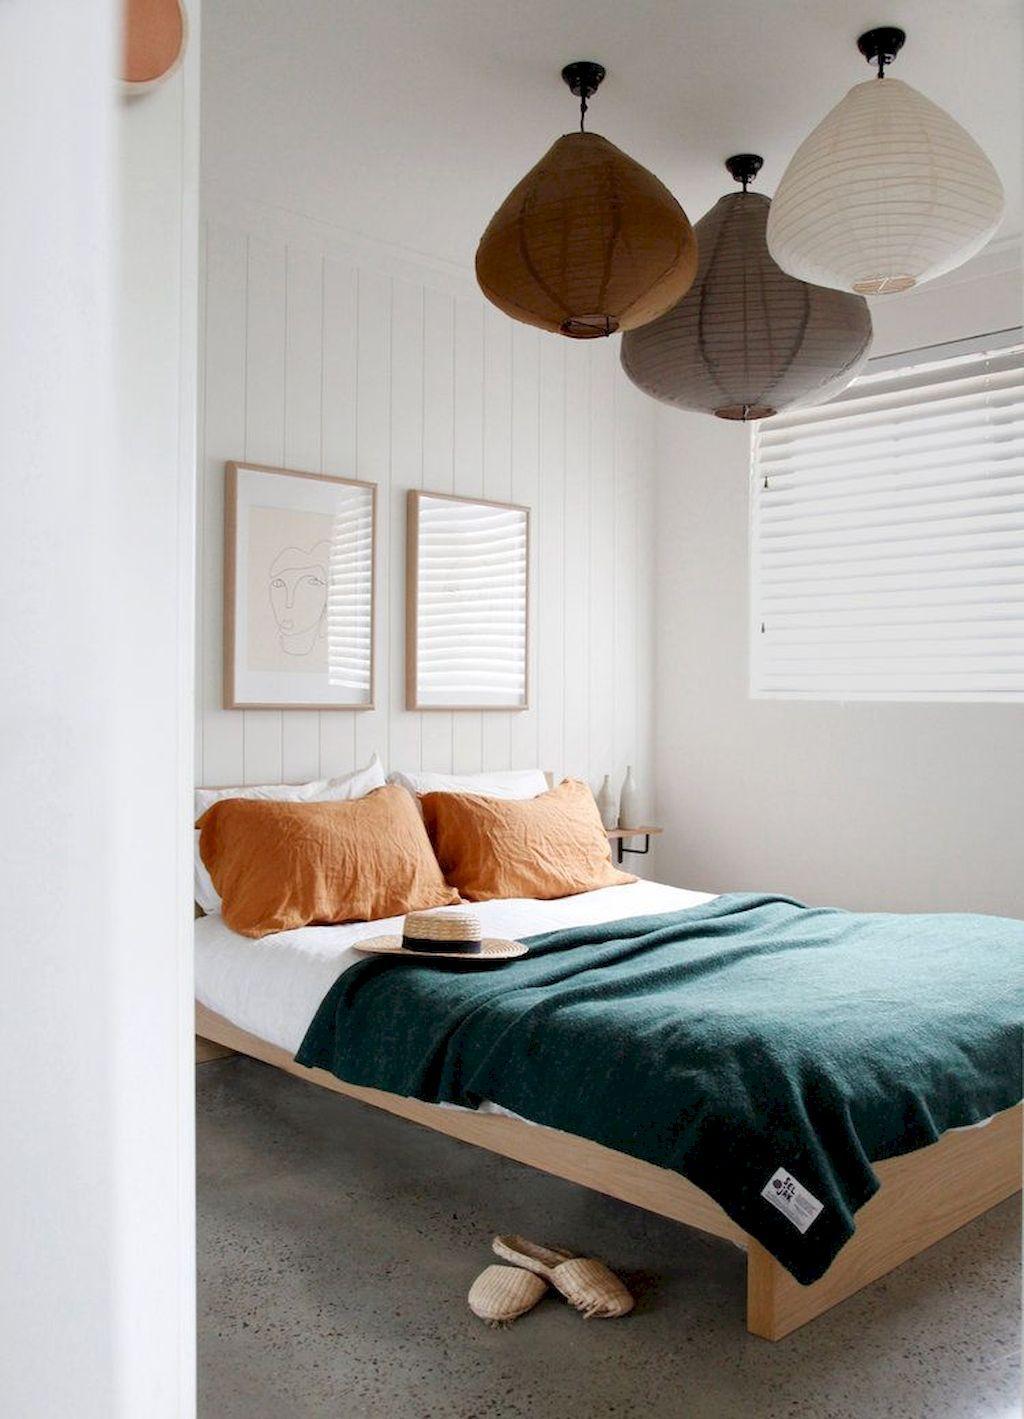 simple bedroom cozy arrangements ideas minimalist on cozy minimalist bedroom decorating ideas id=58625